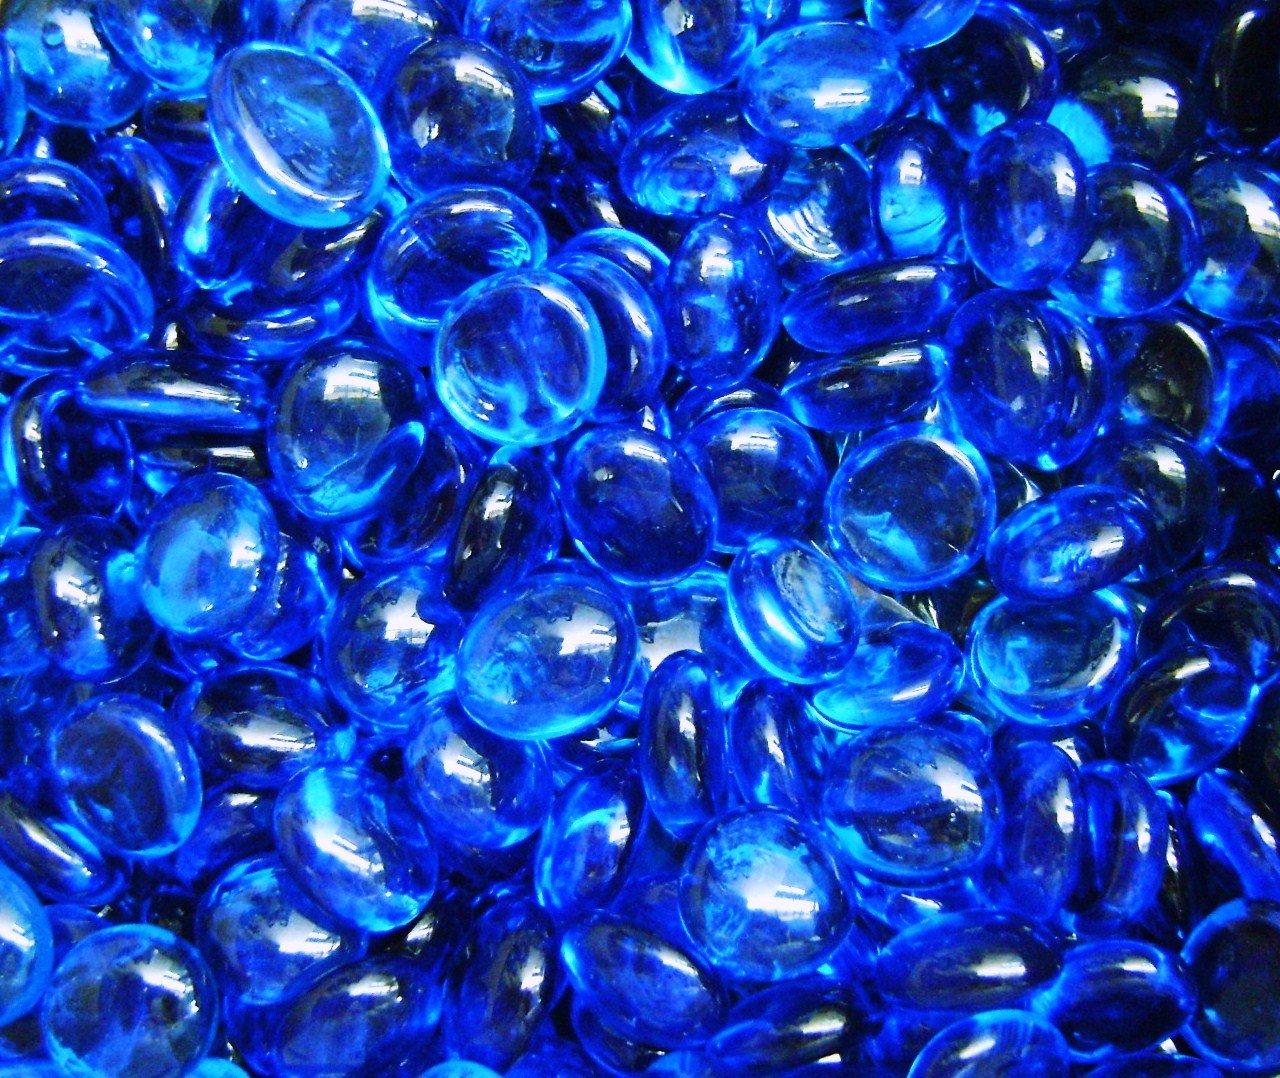 Amazon creative stuff glass 1 lb aqua blue glass gems amazon creative stuff glass 1 lb aqua blue glass gems vase fillers 12 14mm approx 12 pet supplies reviewsmspy